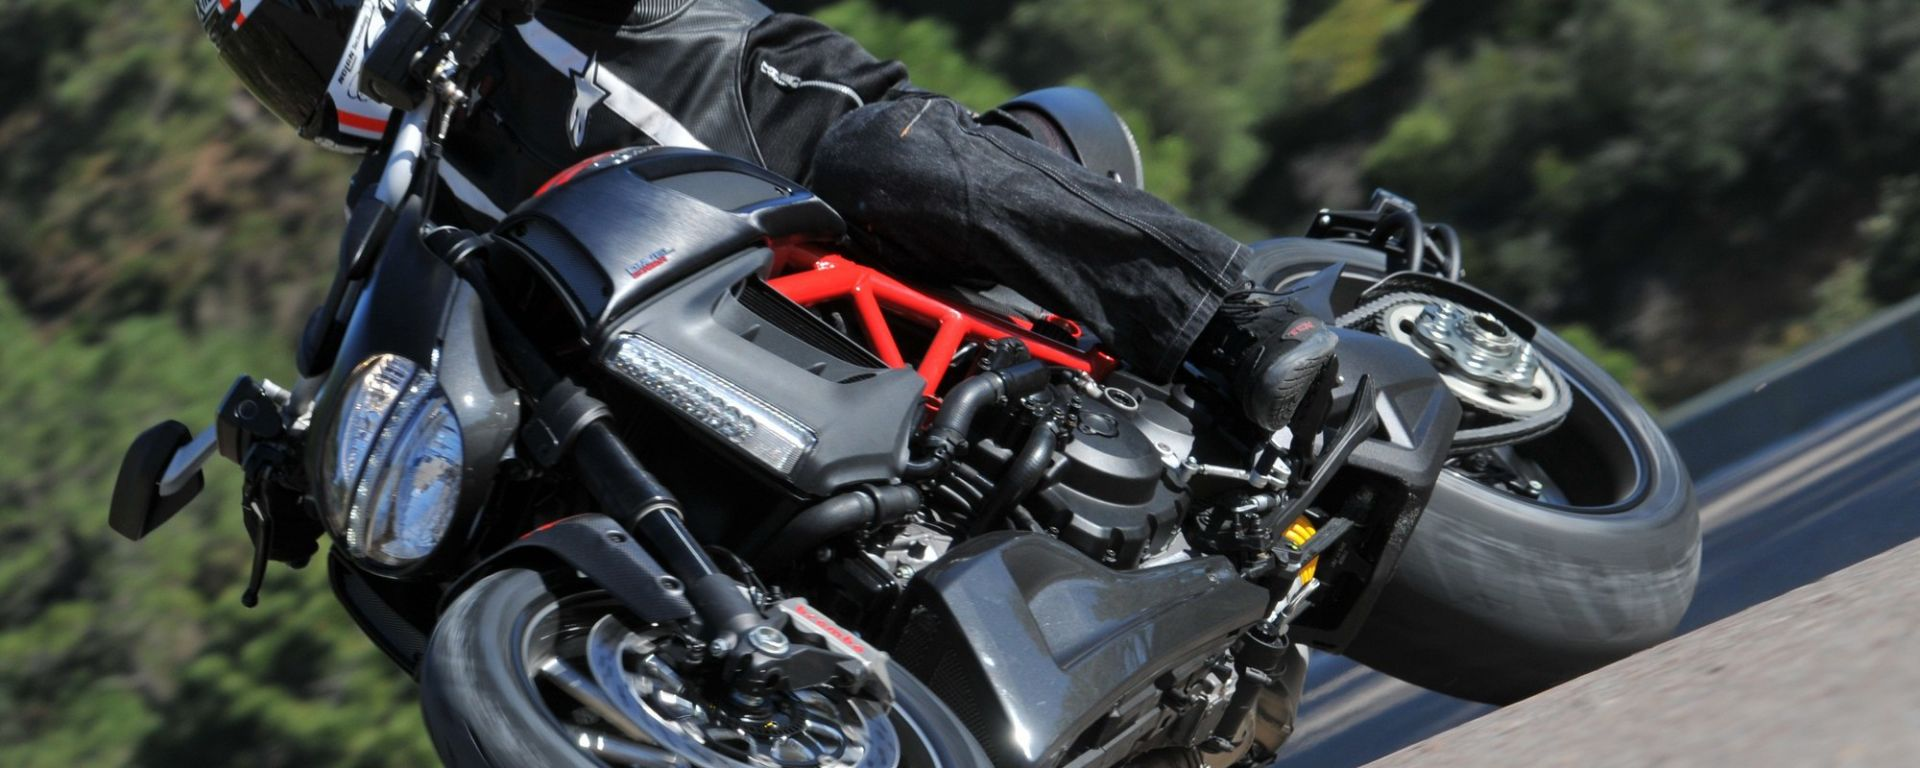 Ducati Diavel a quota 5.000